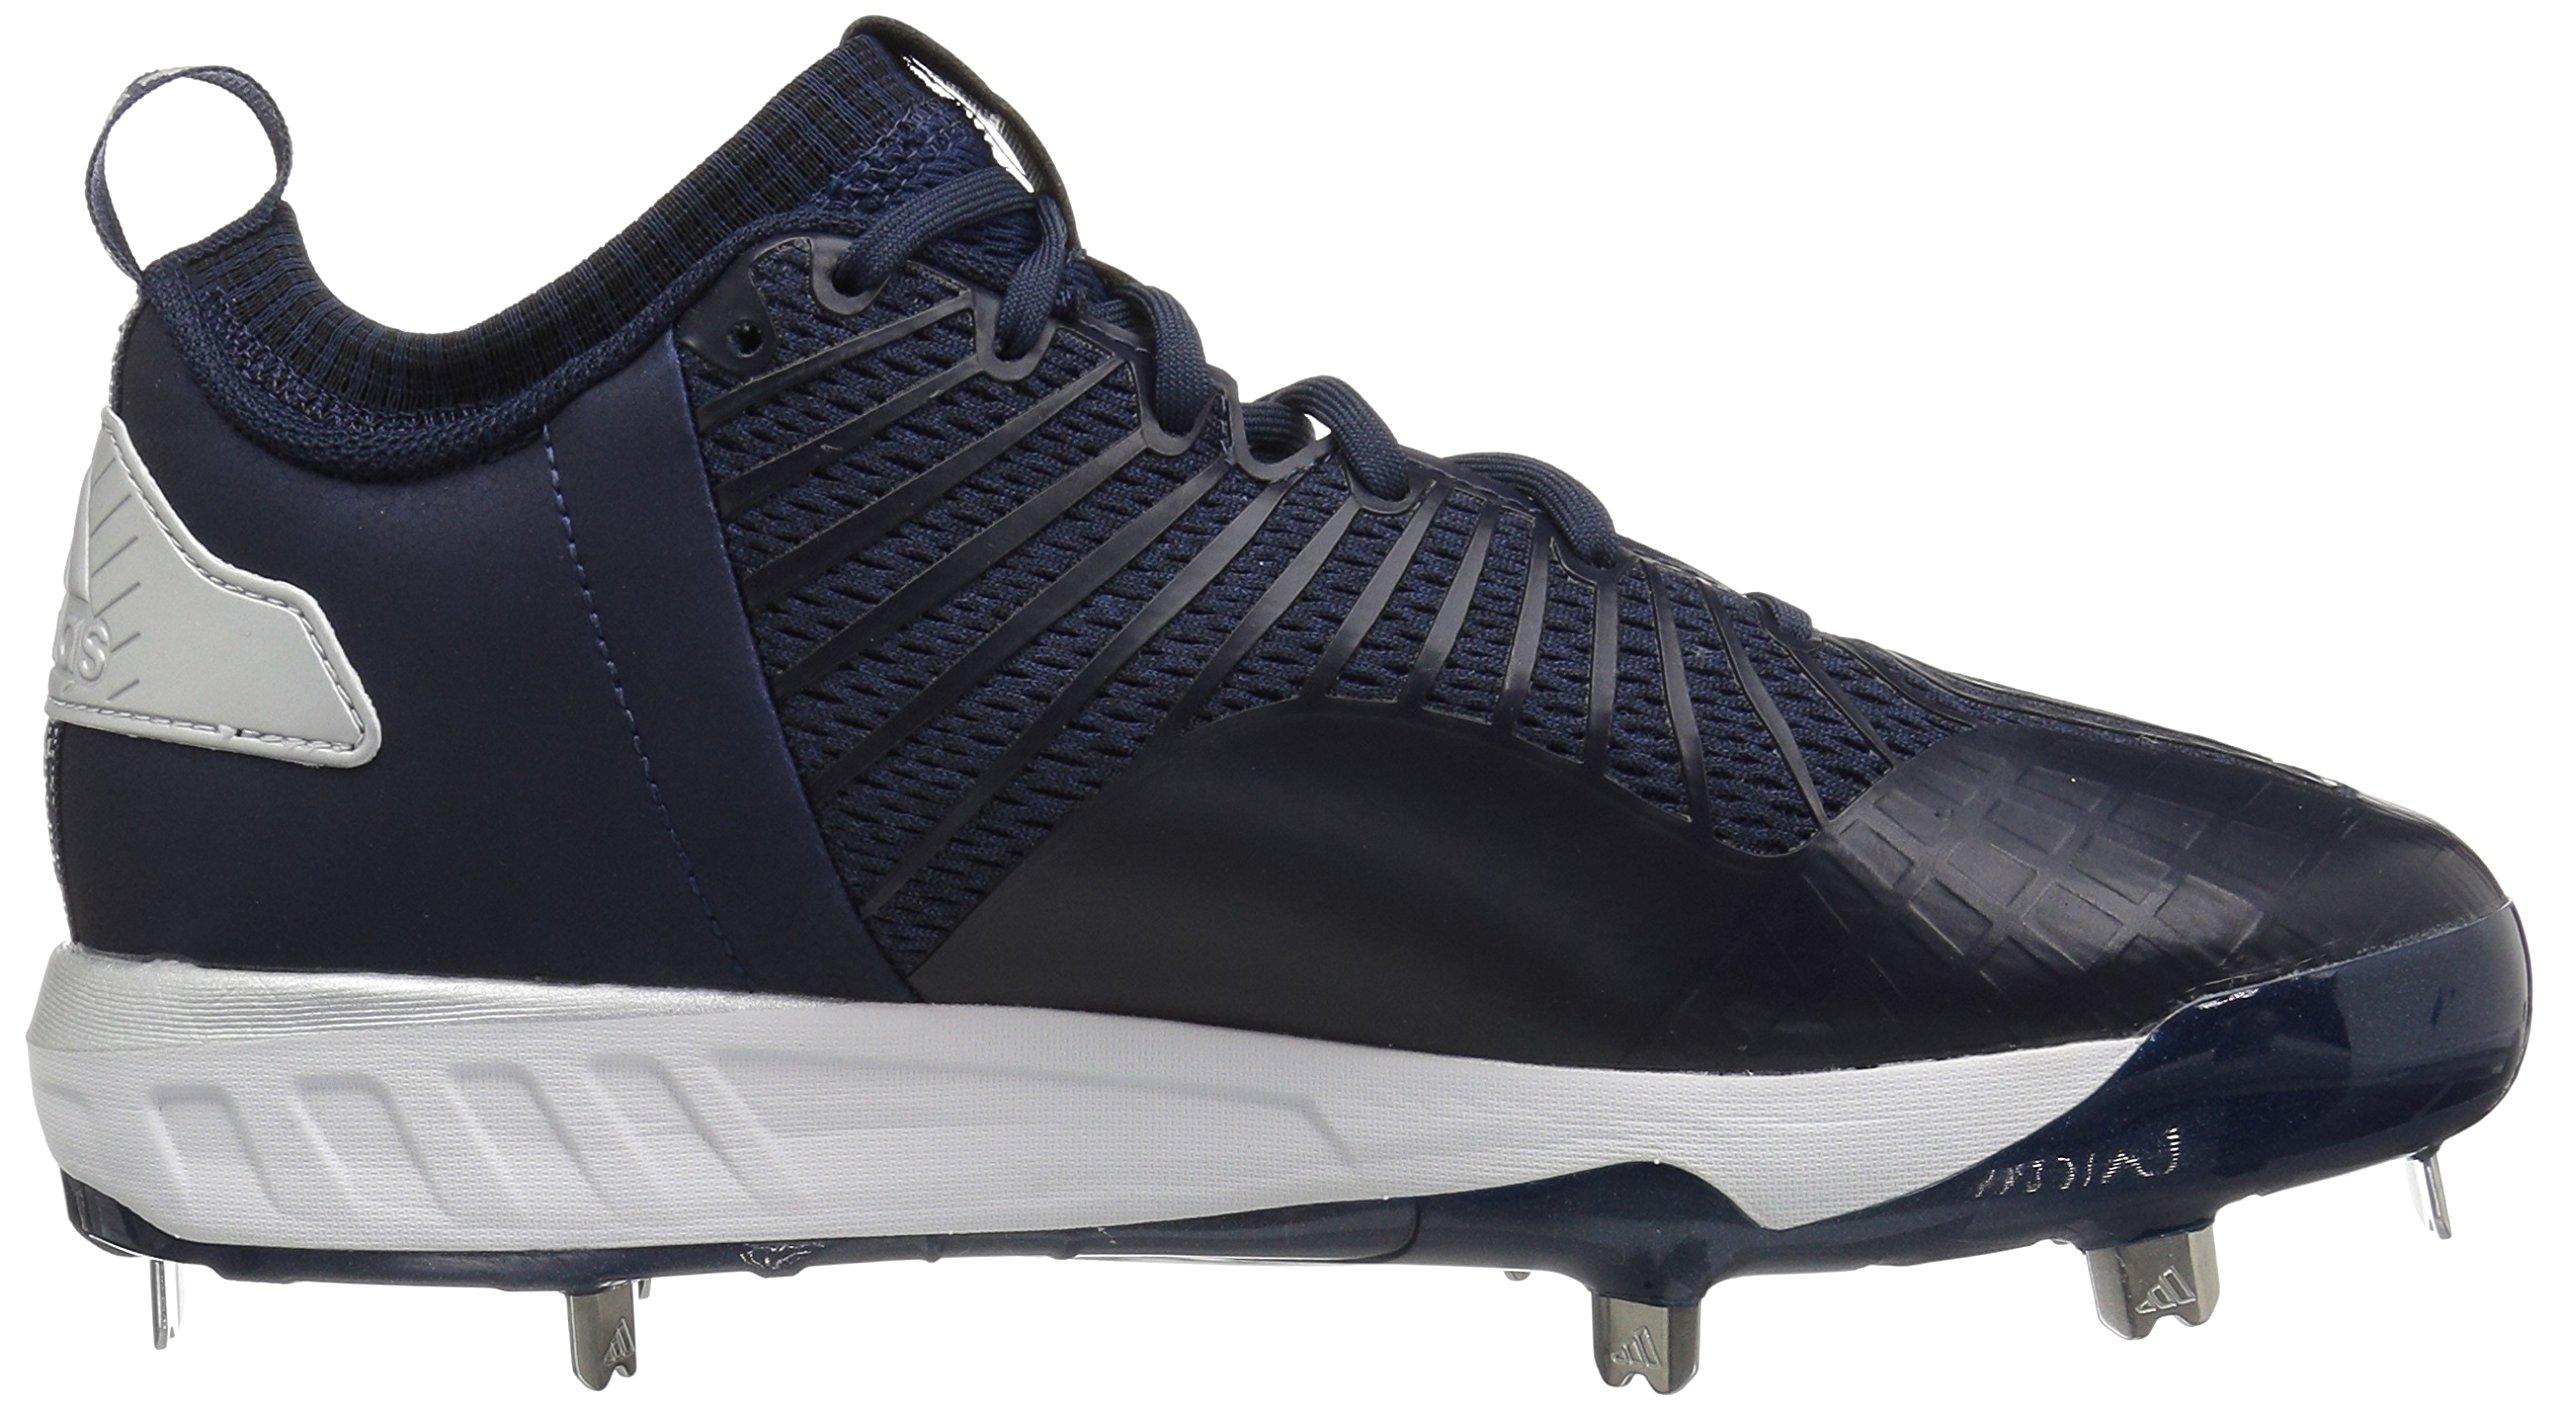 adidas Men's Freak X Carbon Mid Baseball Shoe, Collegiate Navy/White/Metallic Silver, 8 Medium US by adidas (Image #7)